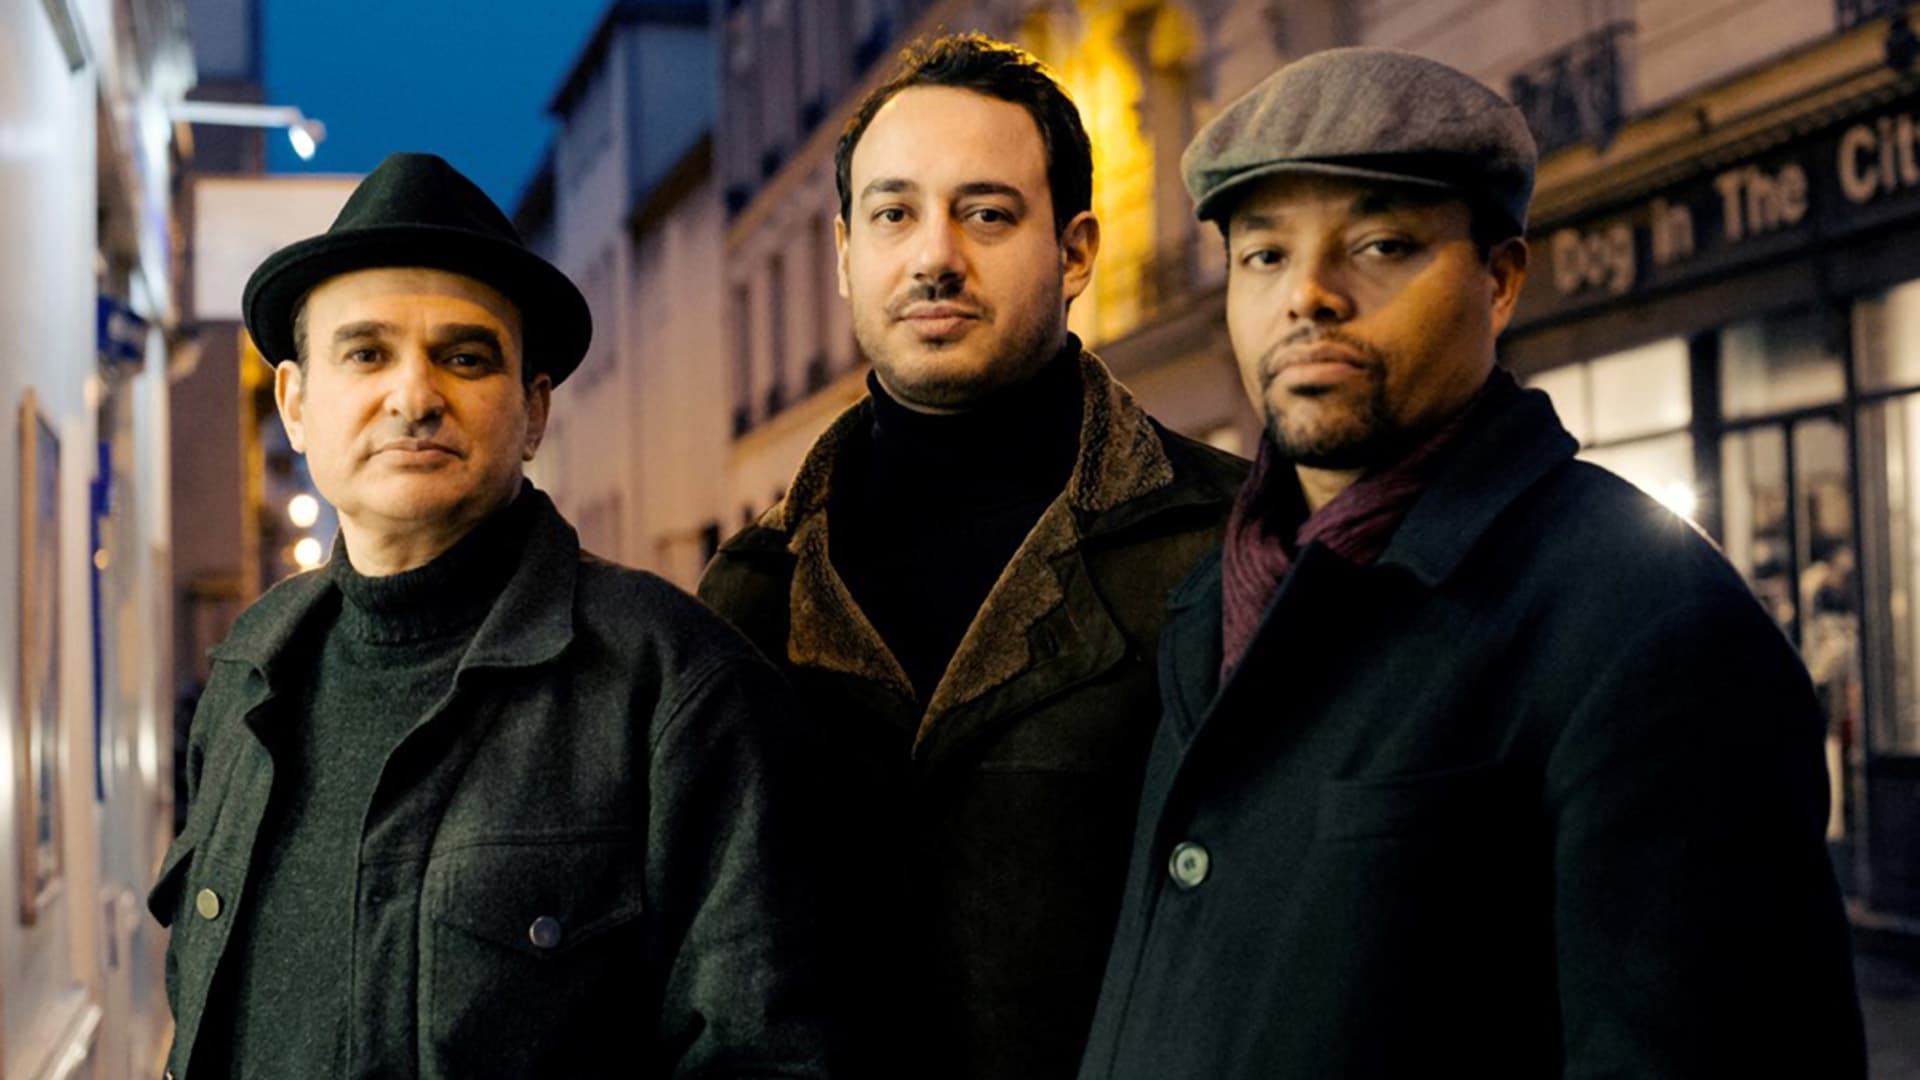 Yacine Boulares (center), Vincent Segal (left), Nasheet Waits (right)